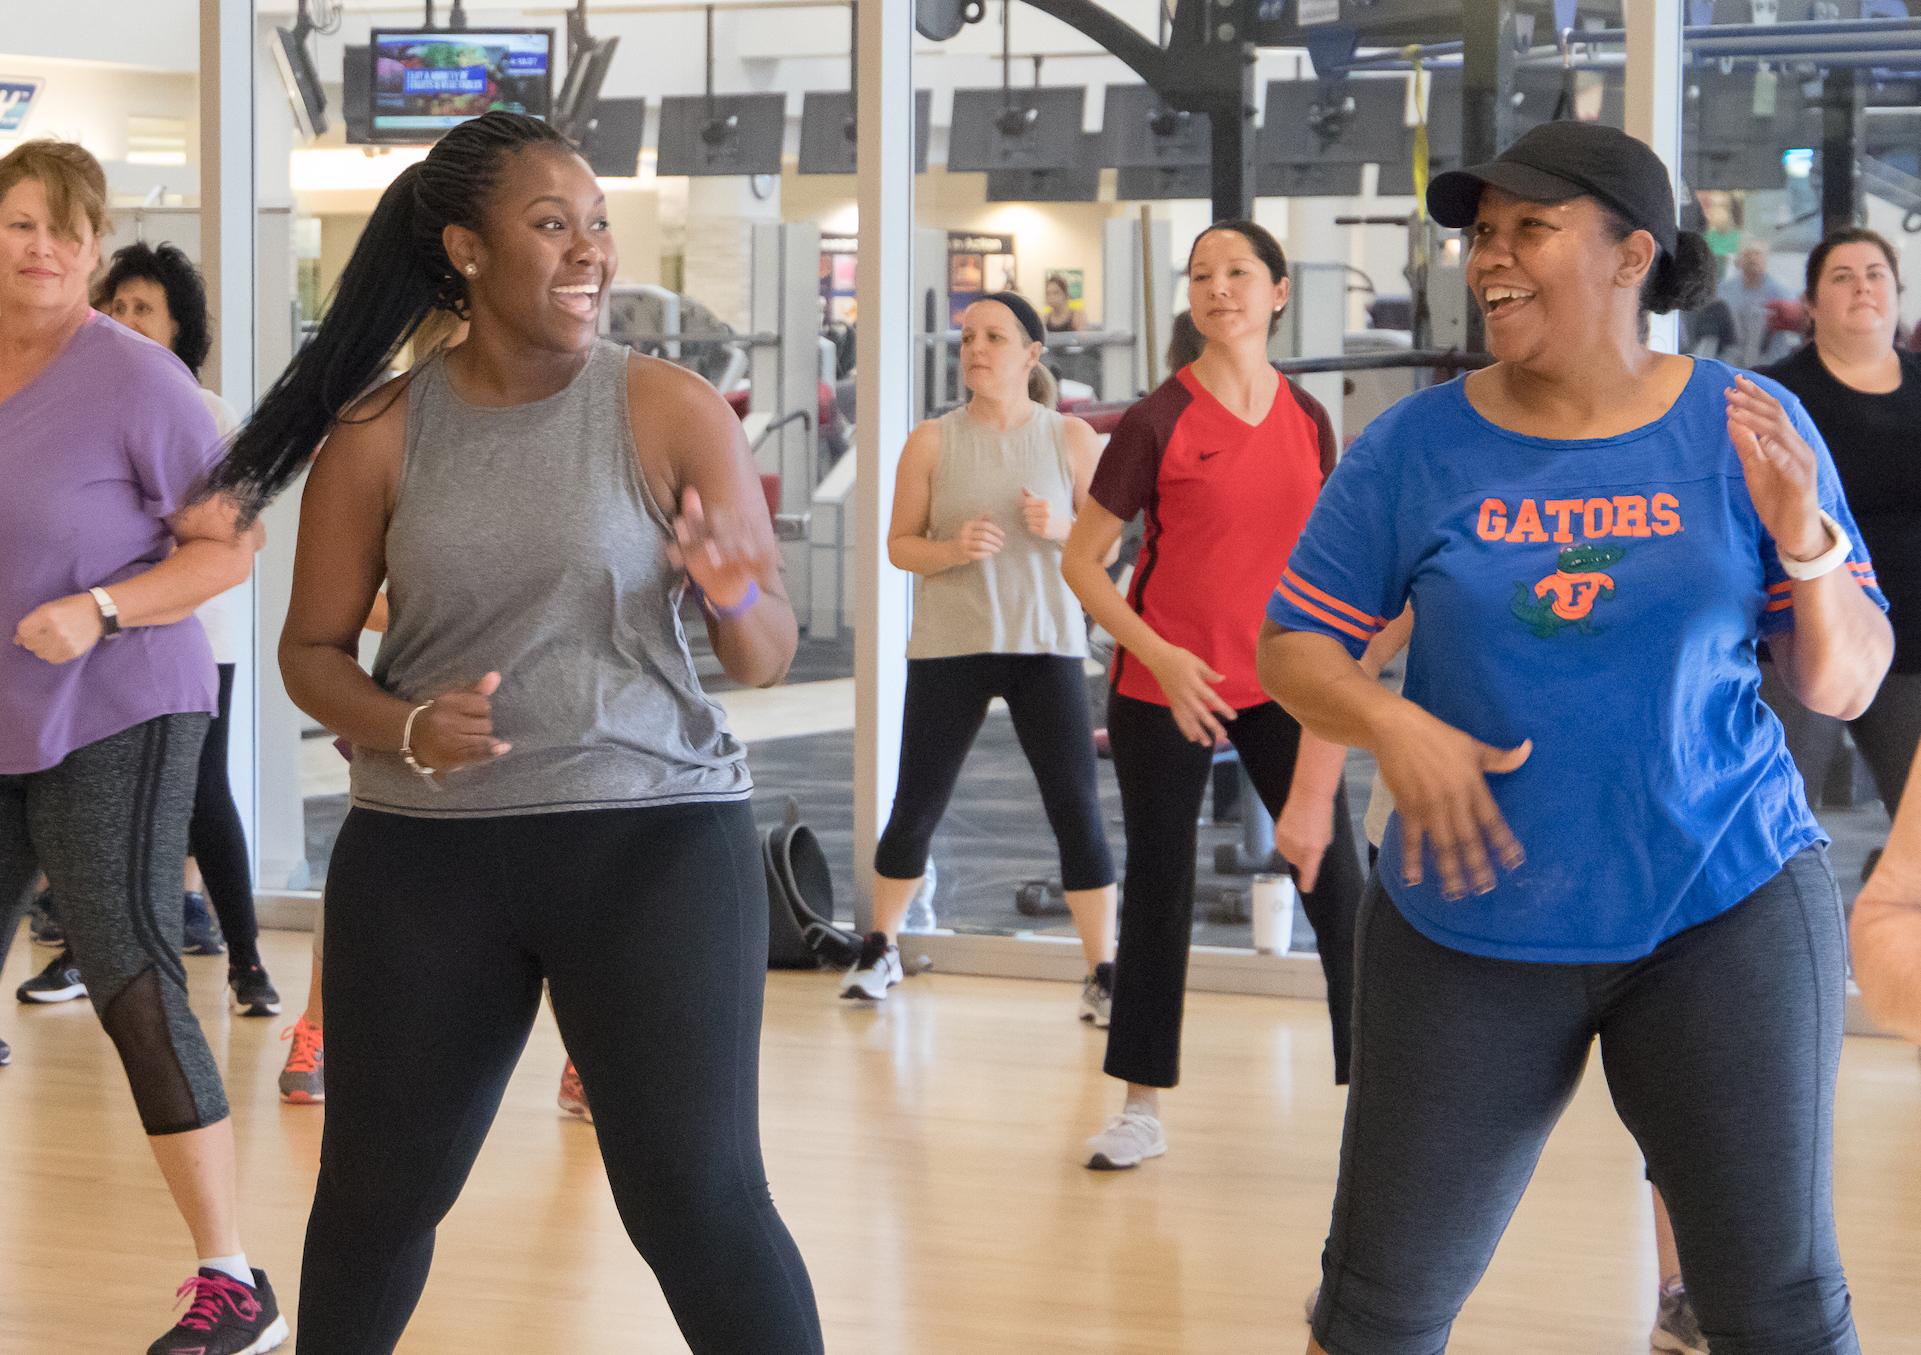 UJam Group Fitness Dance